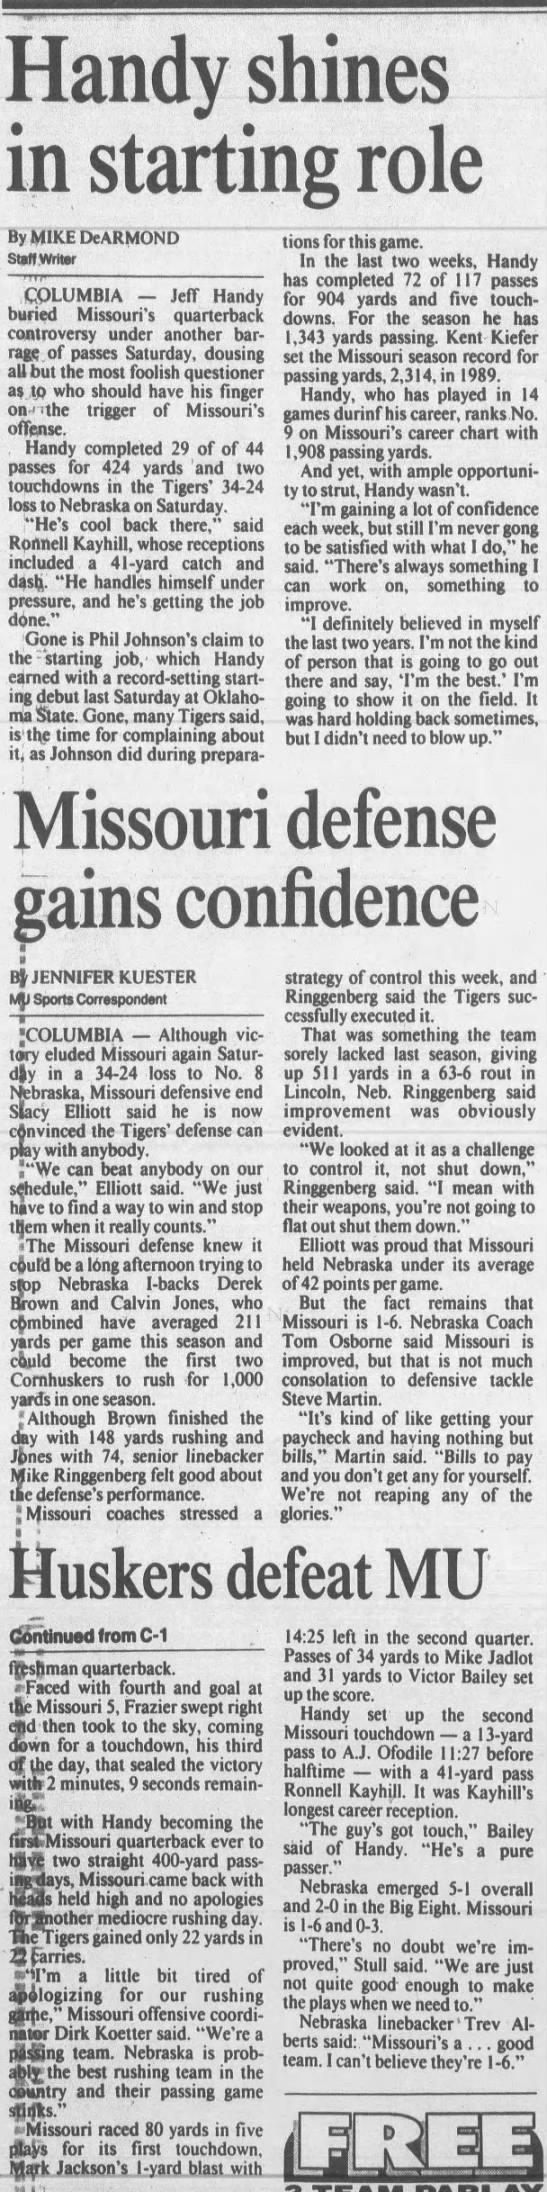 1992 Nebraska-Missouri football, KC2 -